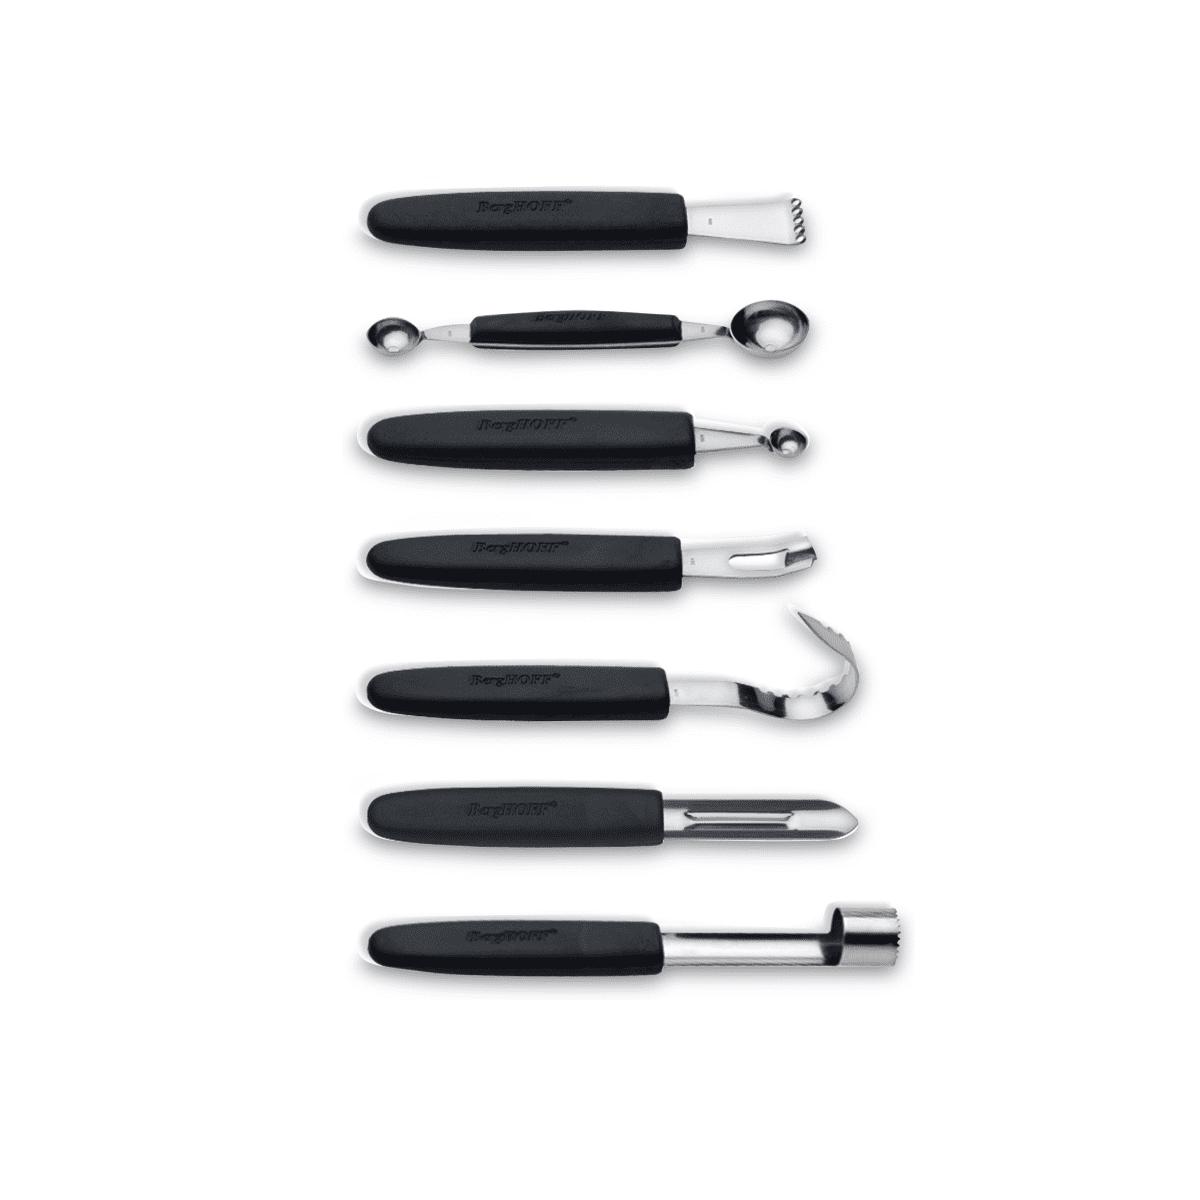 Berghoff 8 Piece Stainless Steel Garnishing Tool Set